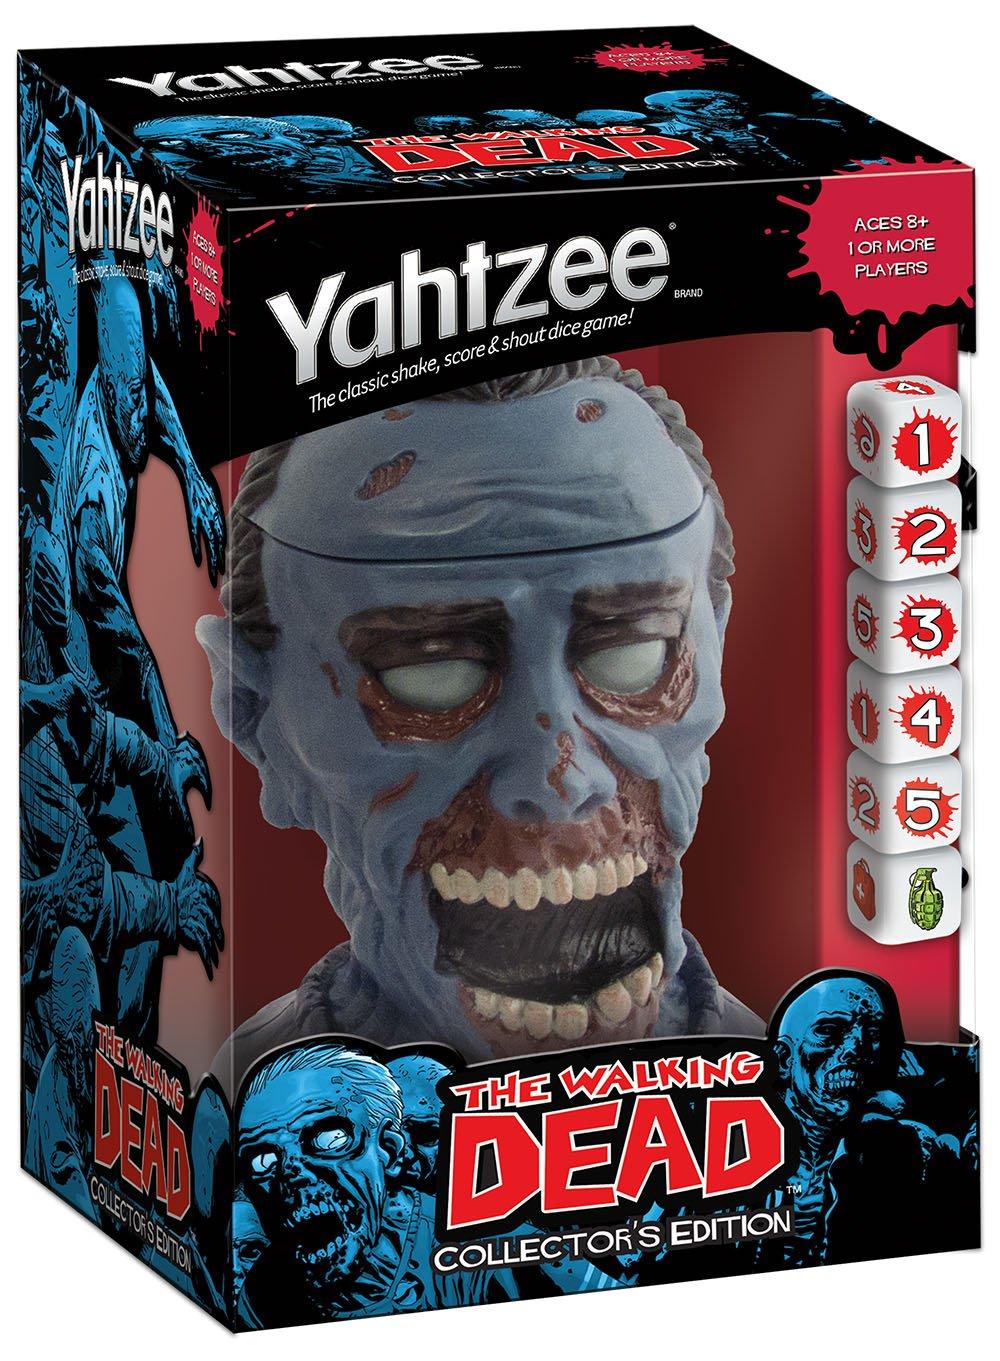 YAHTZEE: The Walking Dead Collector's Edition